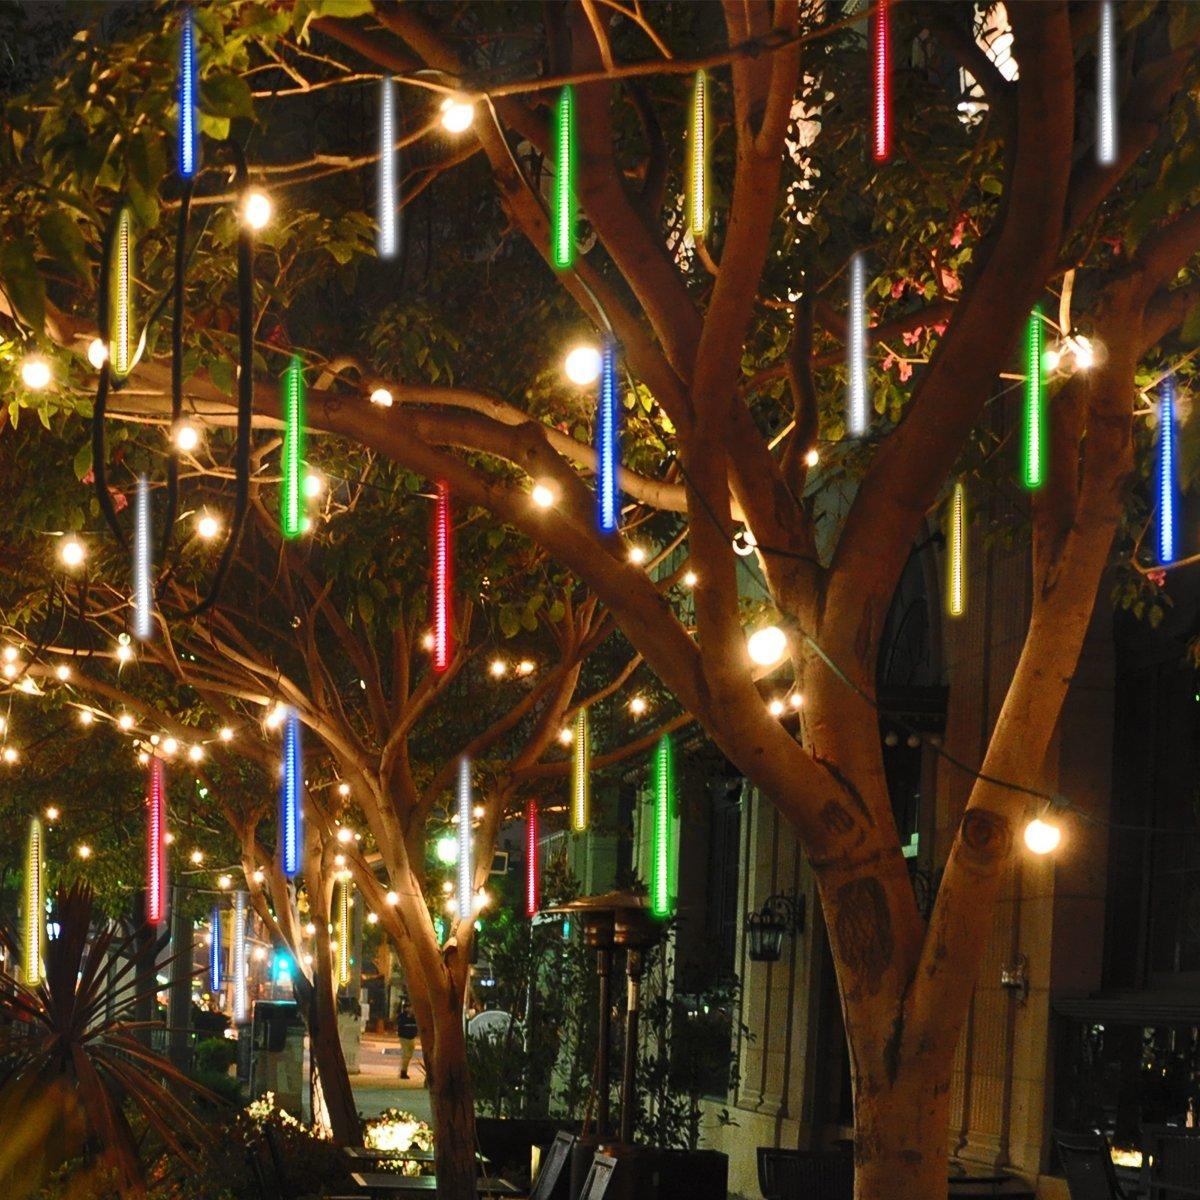 Led Lighting Search For Flights 50cm Meteor Shower Rain Tubes String Light Led Falling Lamp Christmas Tree Lights Wedding Decorative Light Garden Lamp Great Varieties